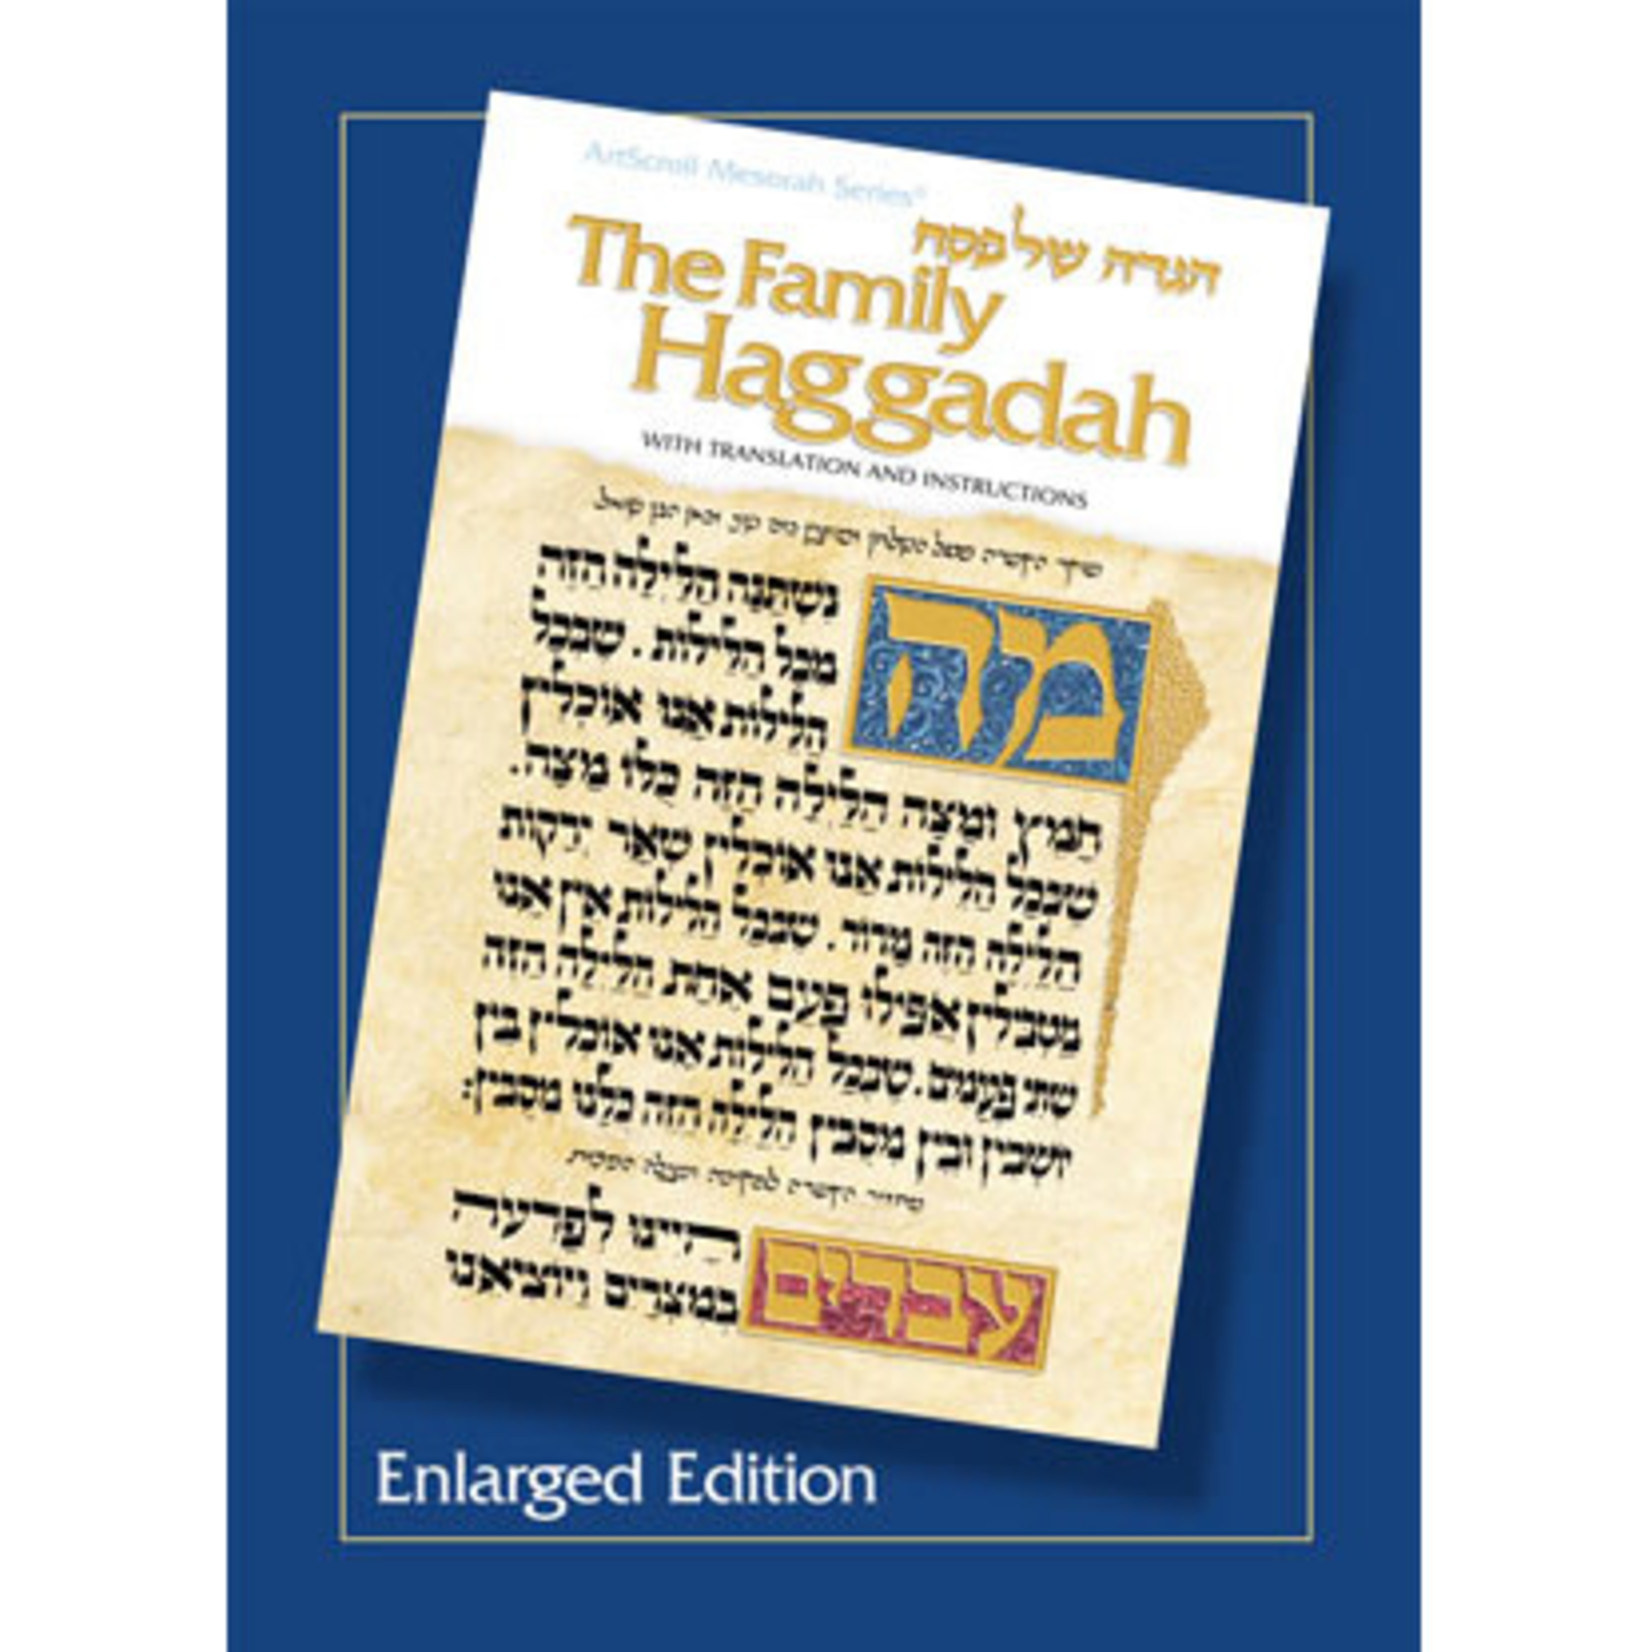 Family Haggadah, Enlarged Edition